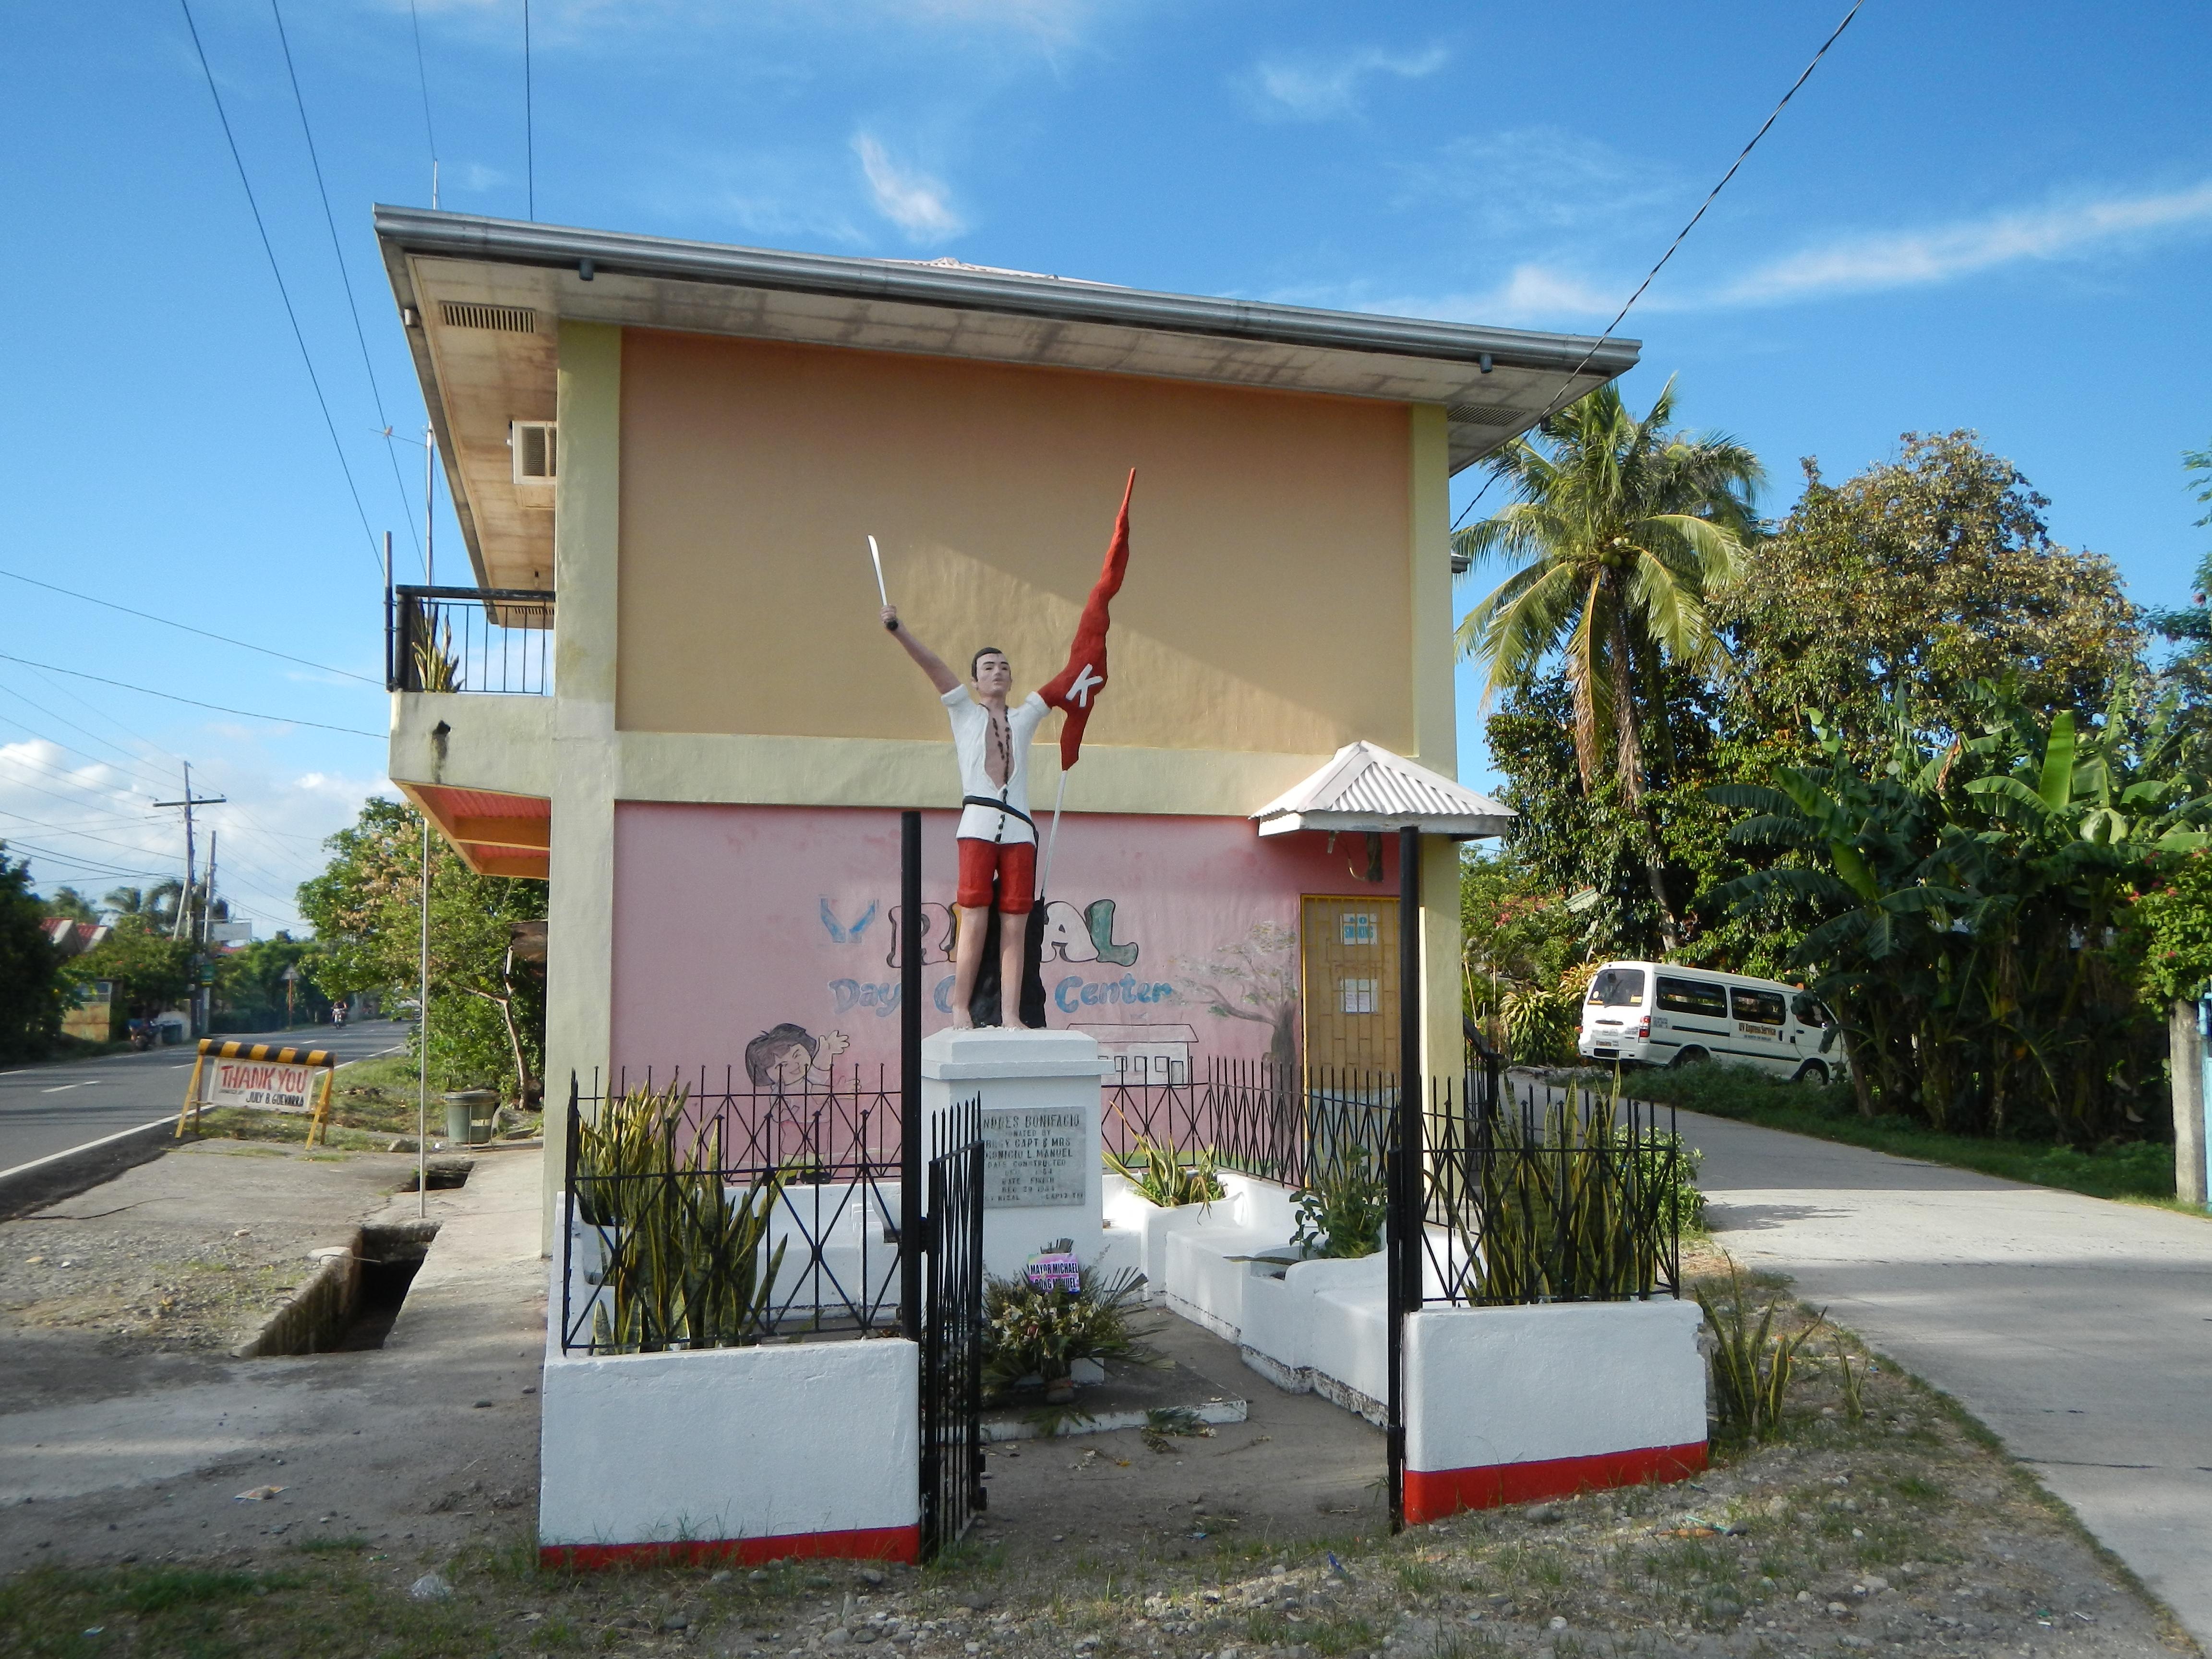 File:7605jfRizal Balanoy La Paz Hall Roads Tarlacfvf 21 ...